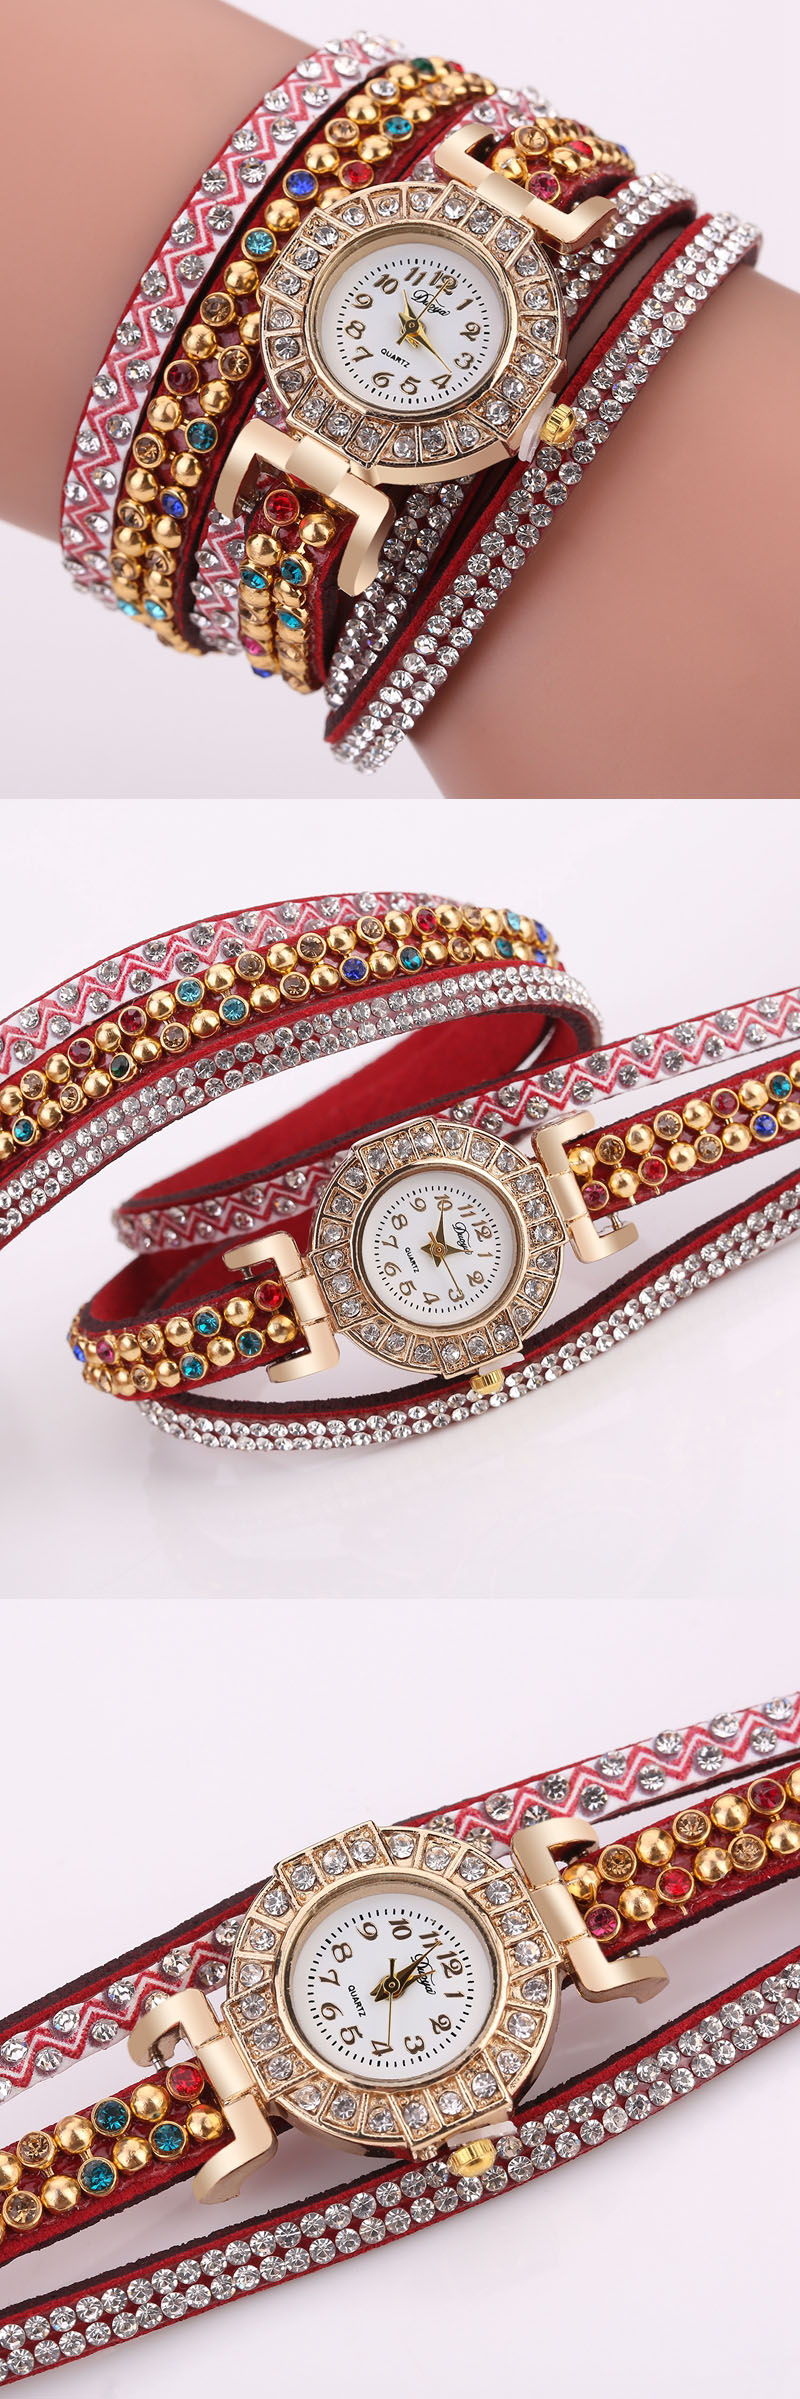 DUOYA Fine Leather Band Winding Crystal Ladies Bracelet Watch Elegant Women Analog Quartz Watches